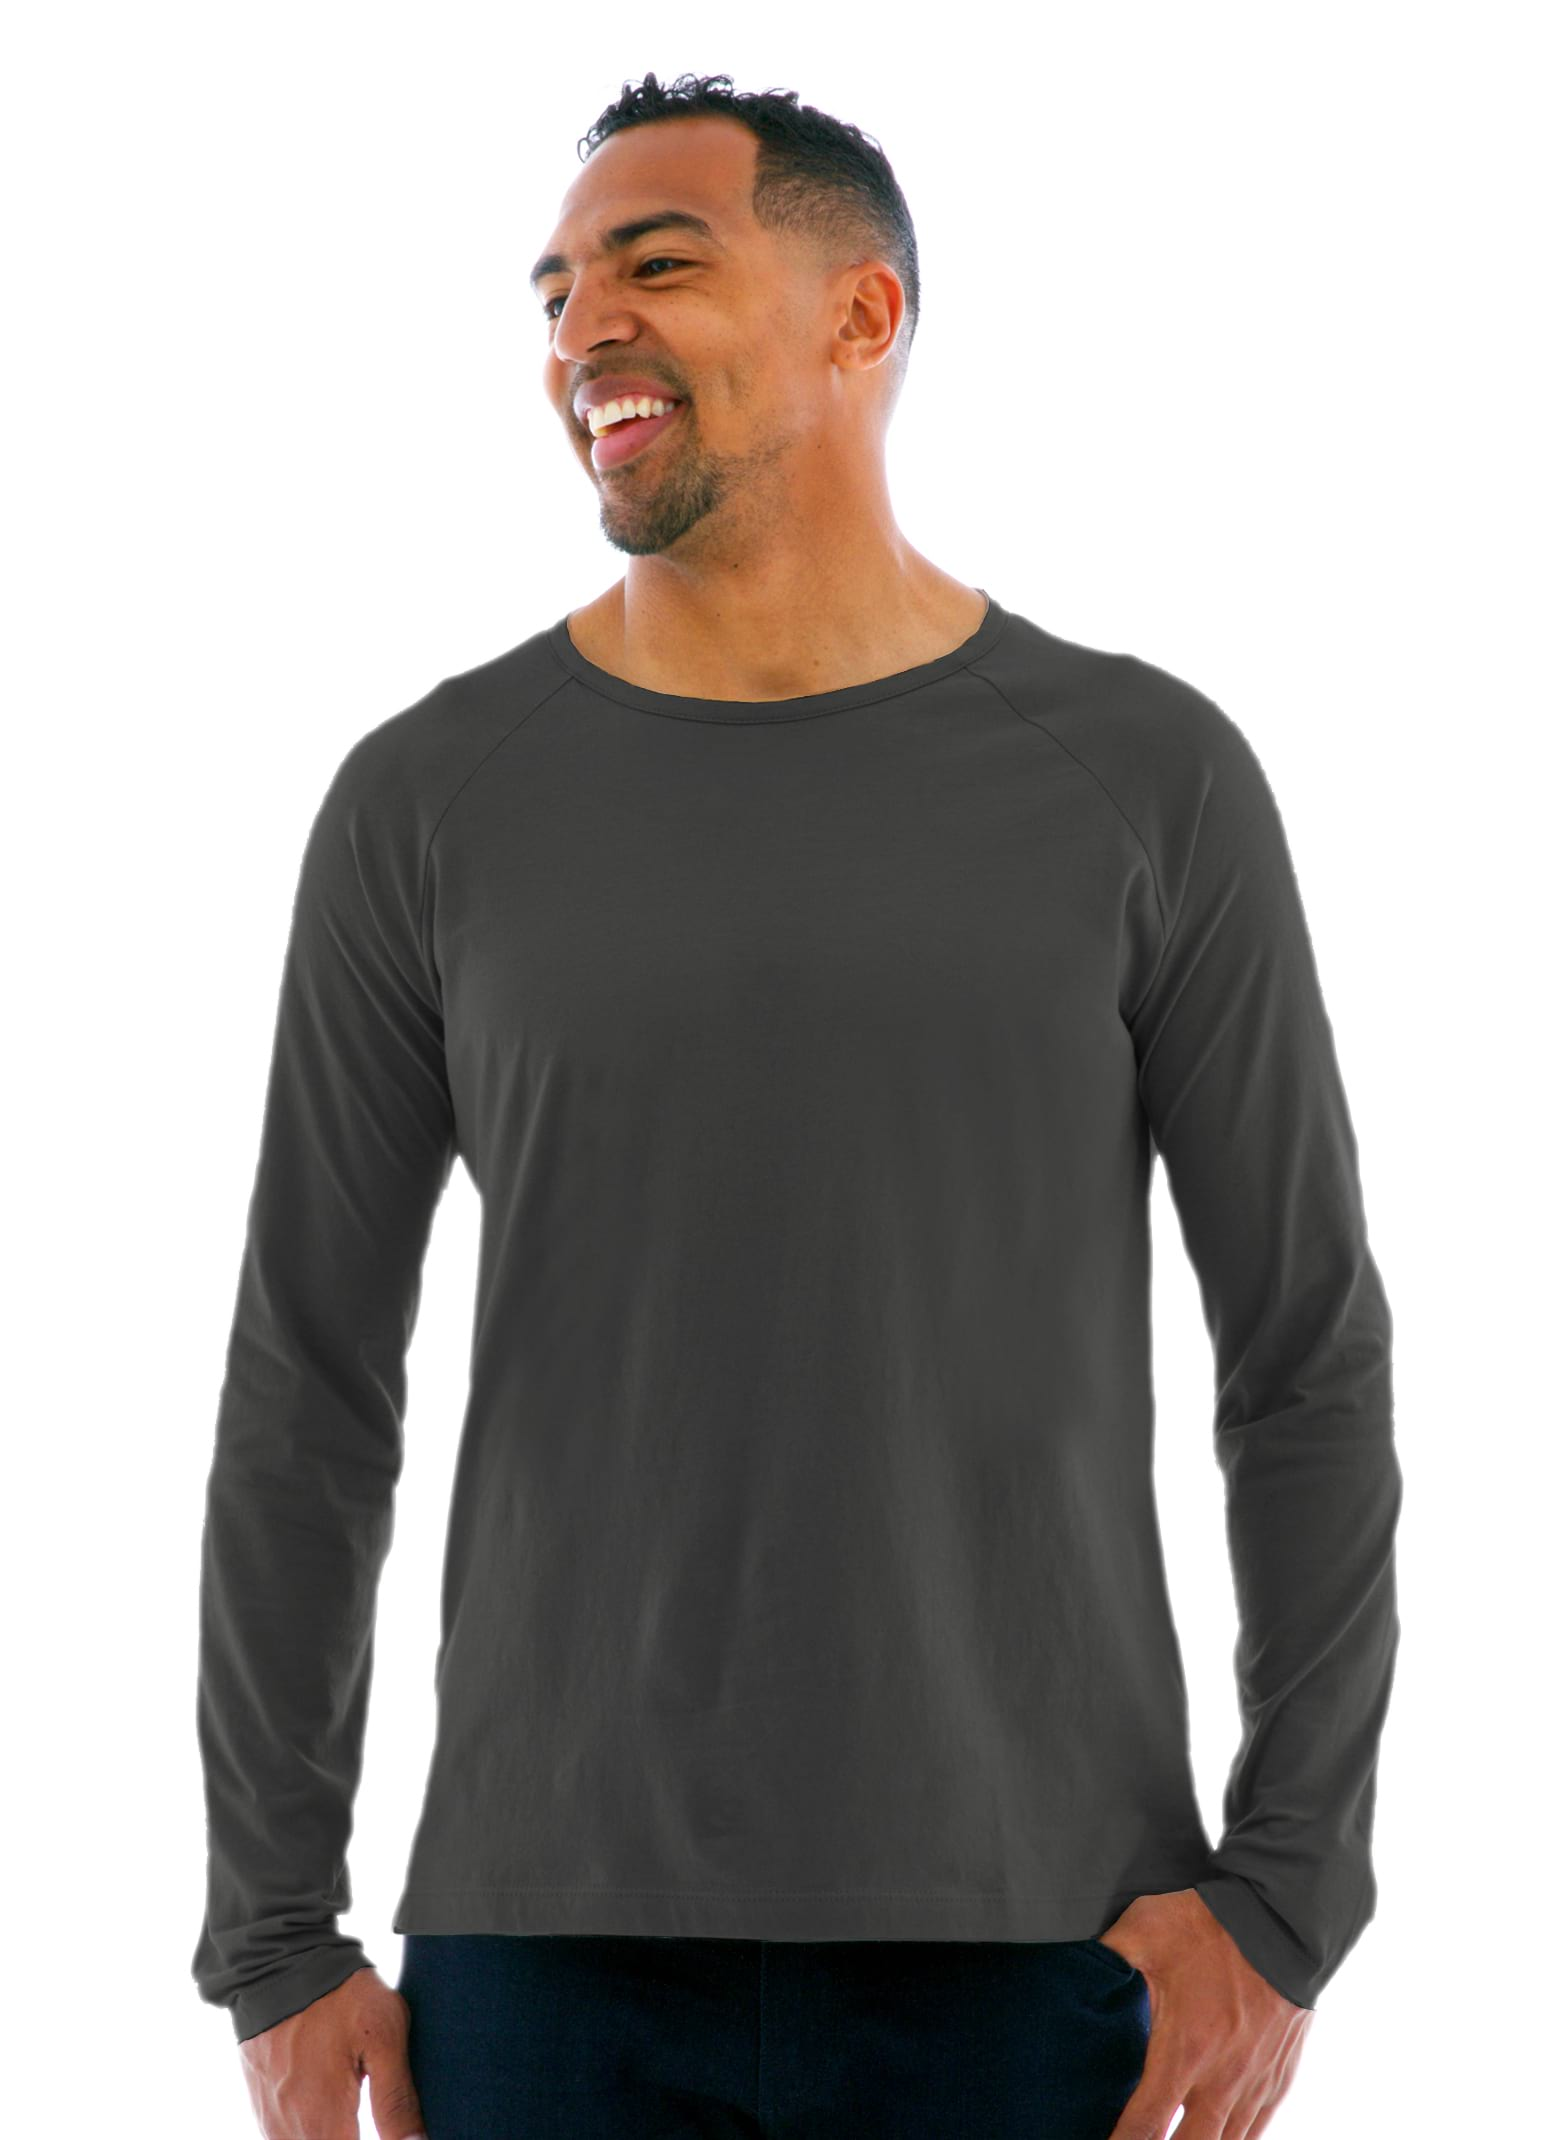 Long Sleeve Raglan Crew T-Shirt in Medium Gray